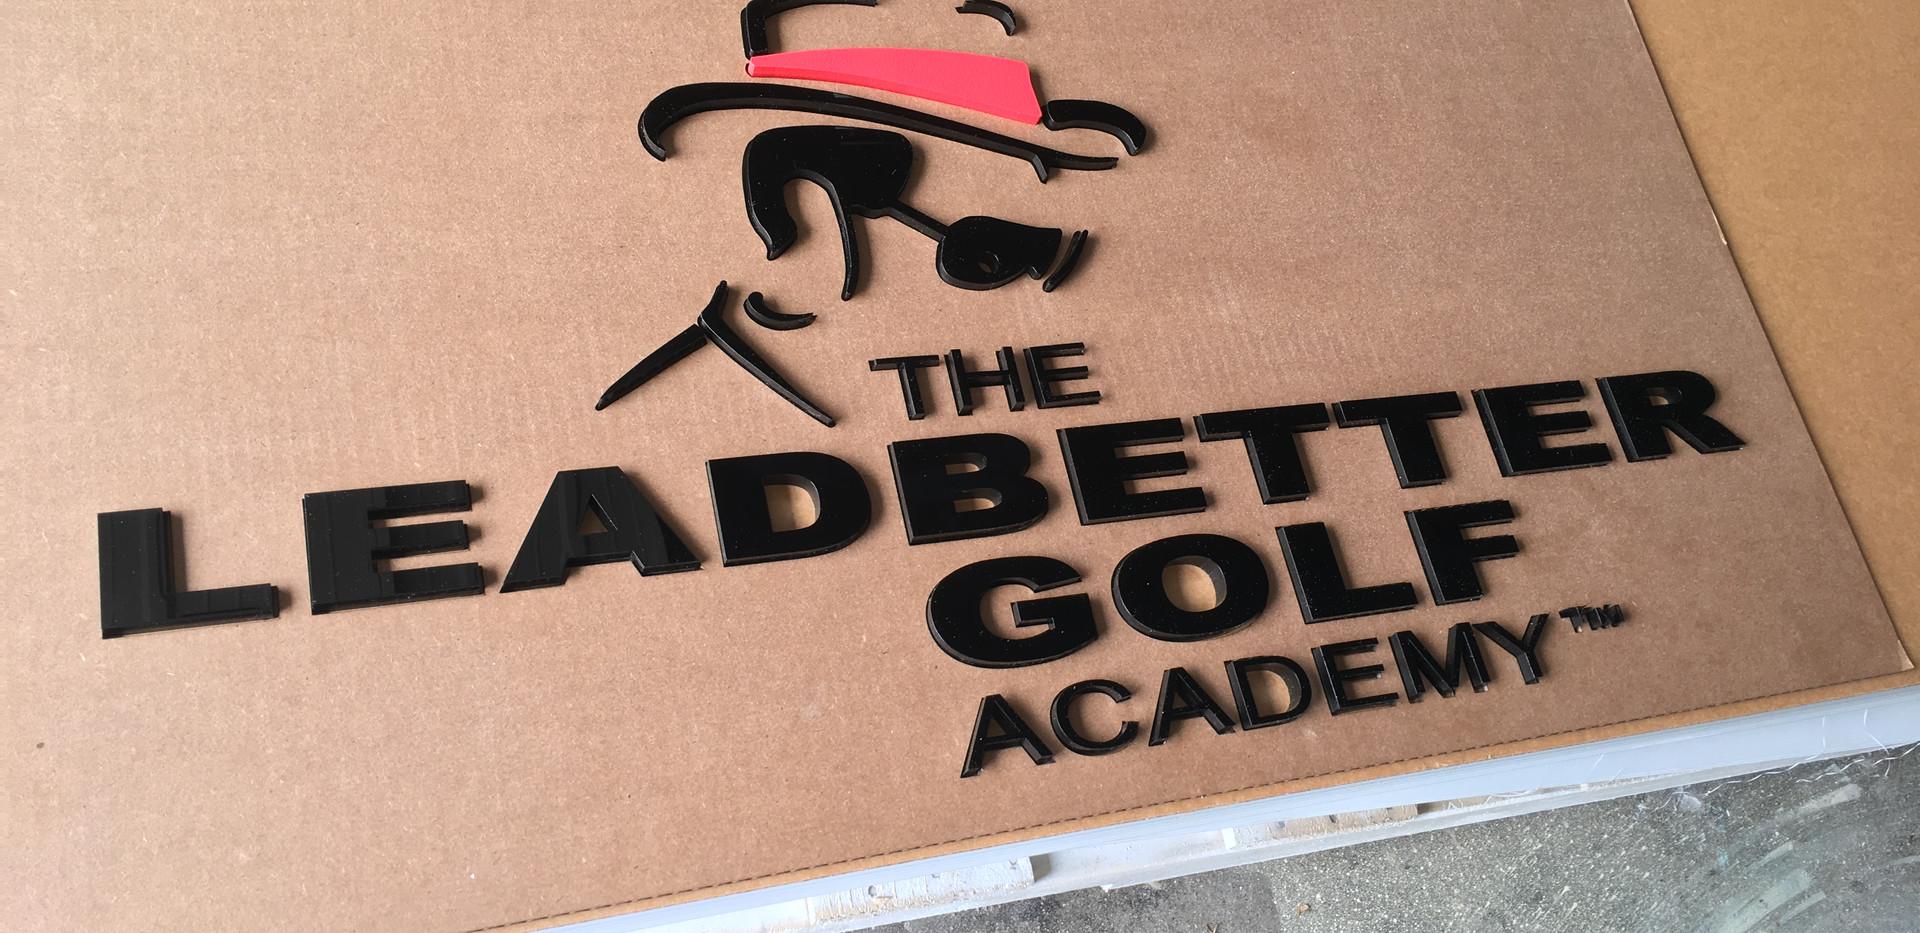 The Leadbetter Golf Academy, FL